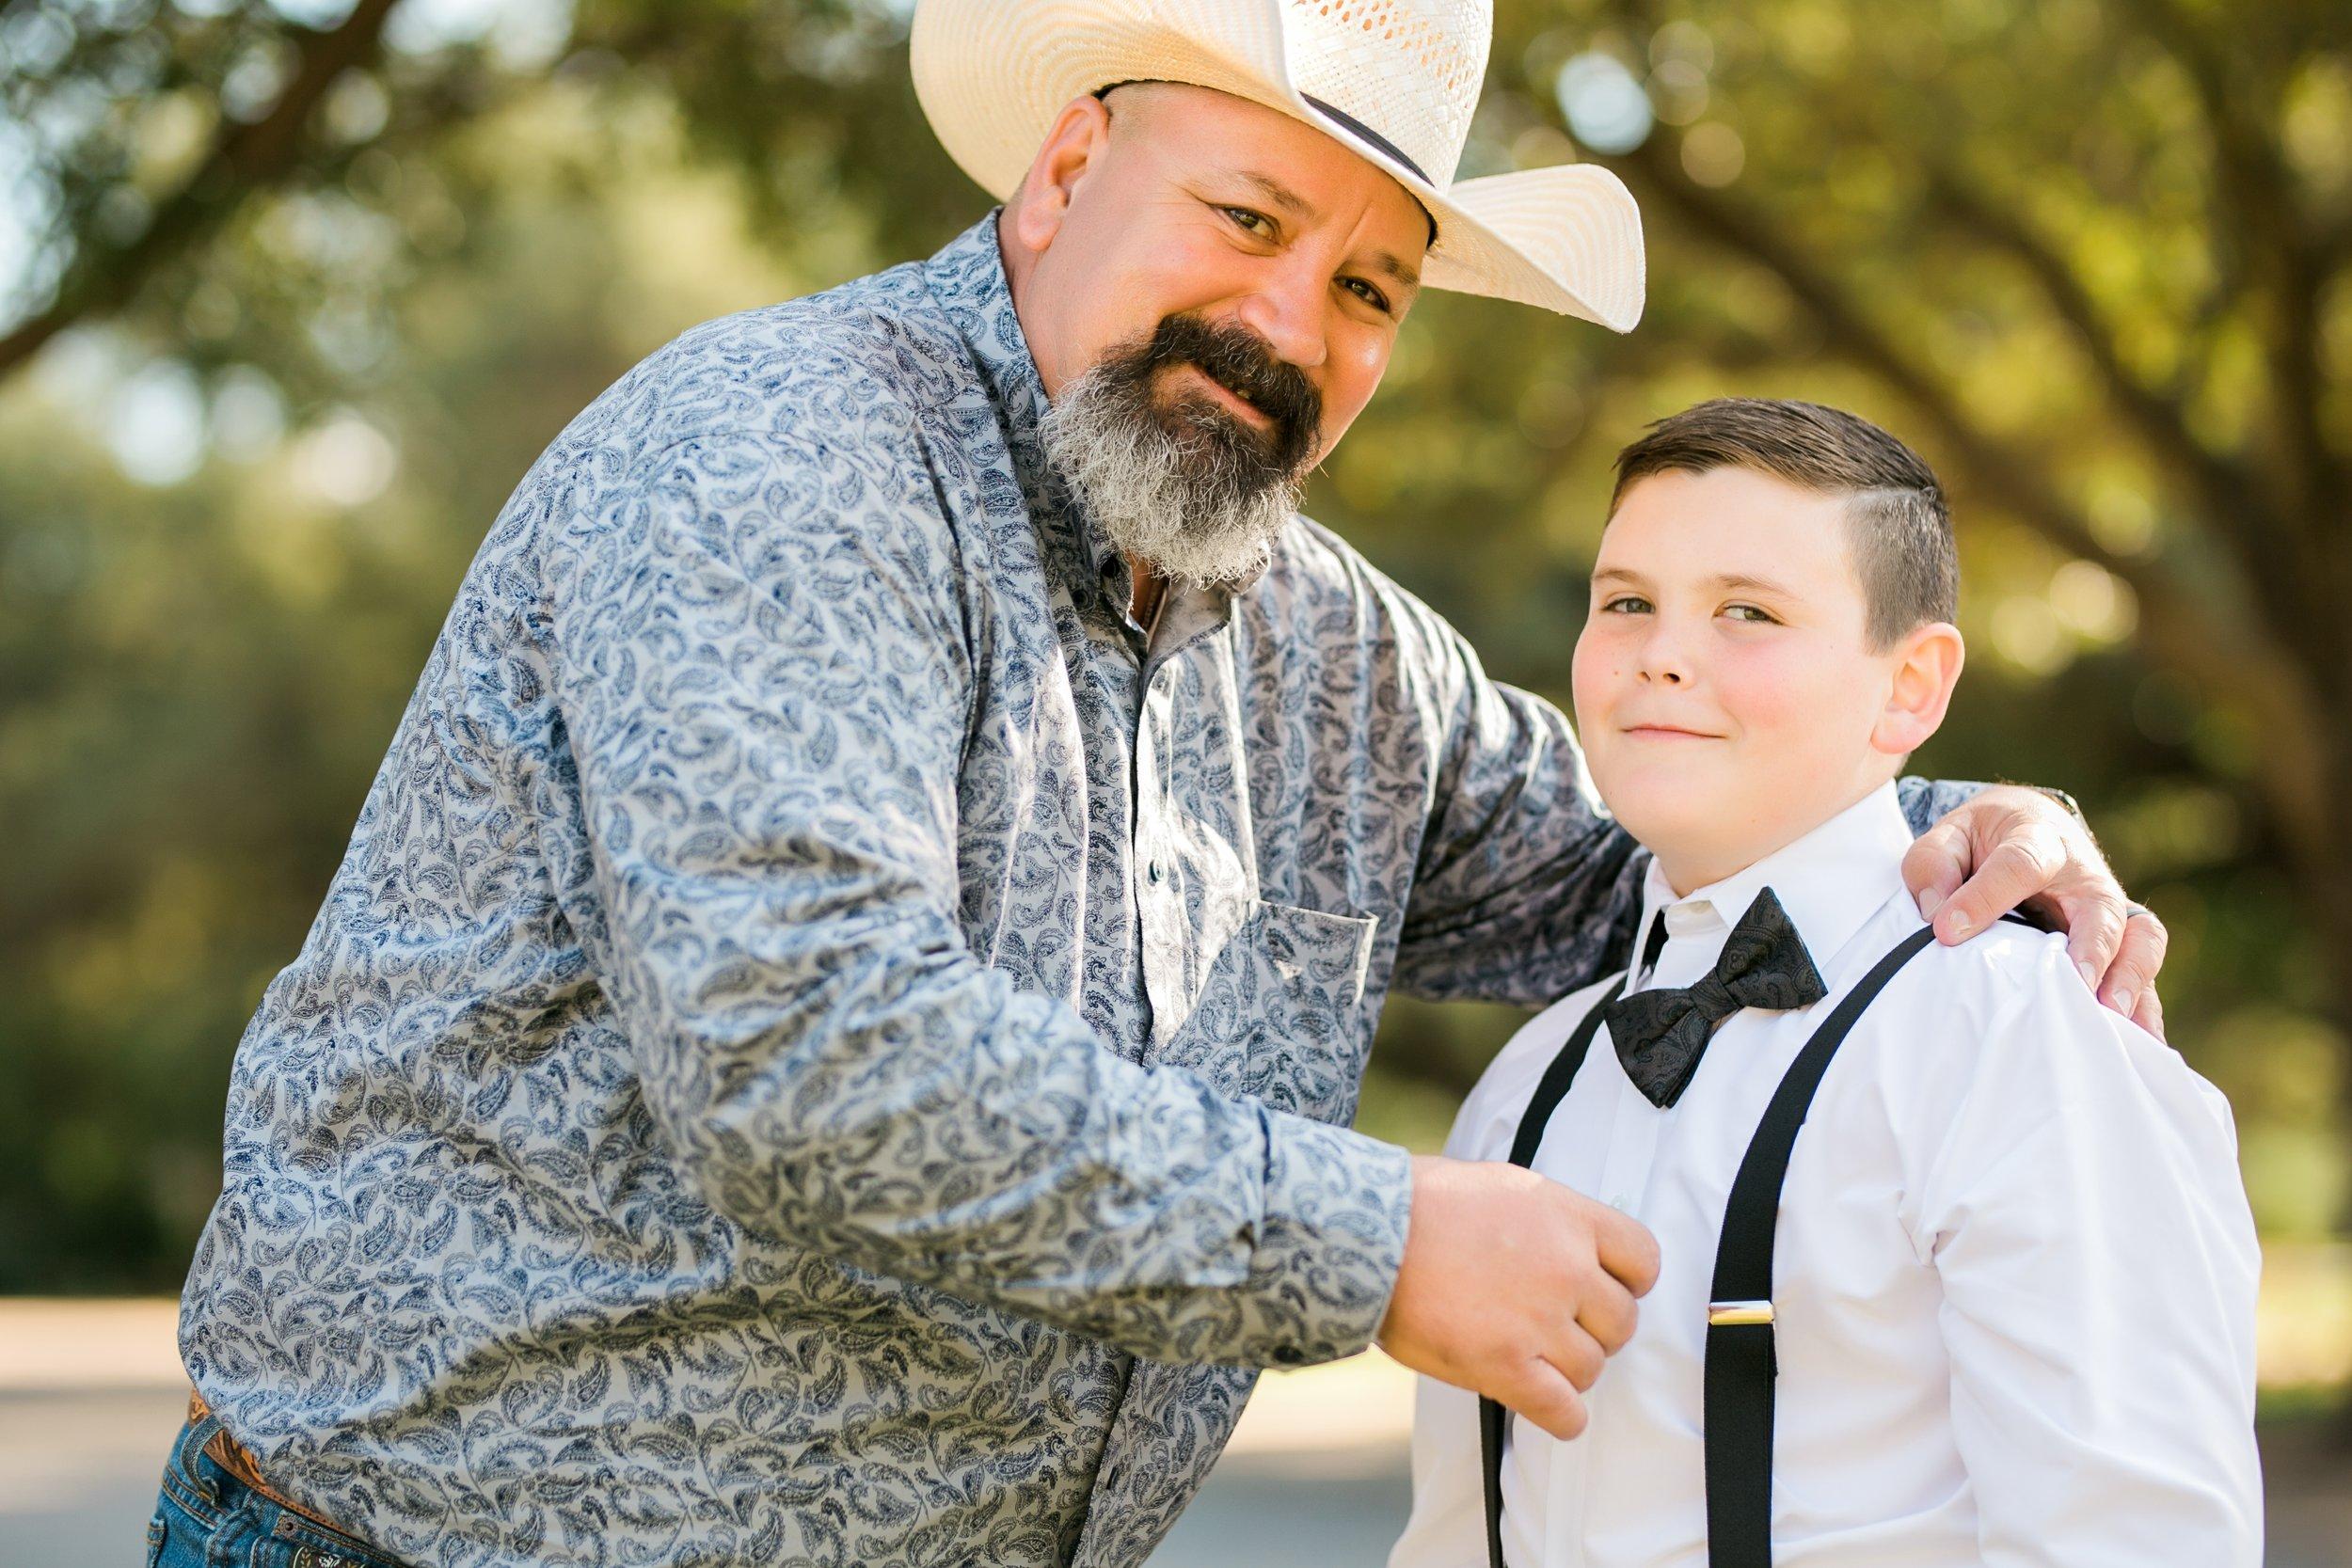 Roberson-Wedding-The-Forum-Lauren-Pinson-Wedding-Photography-Wichita-Falls-Texas-011.jpg